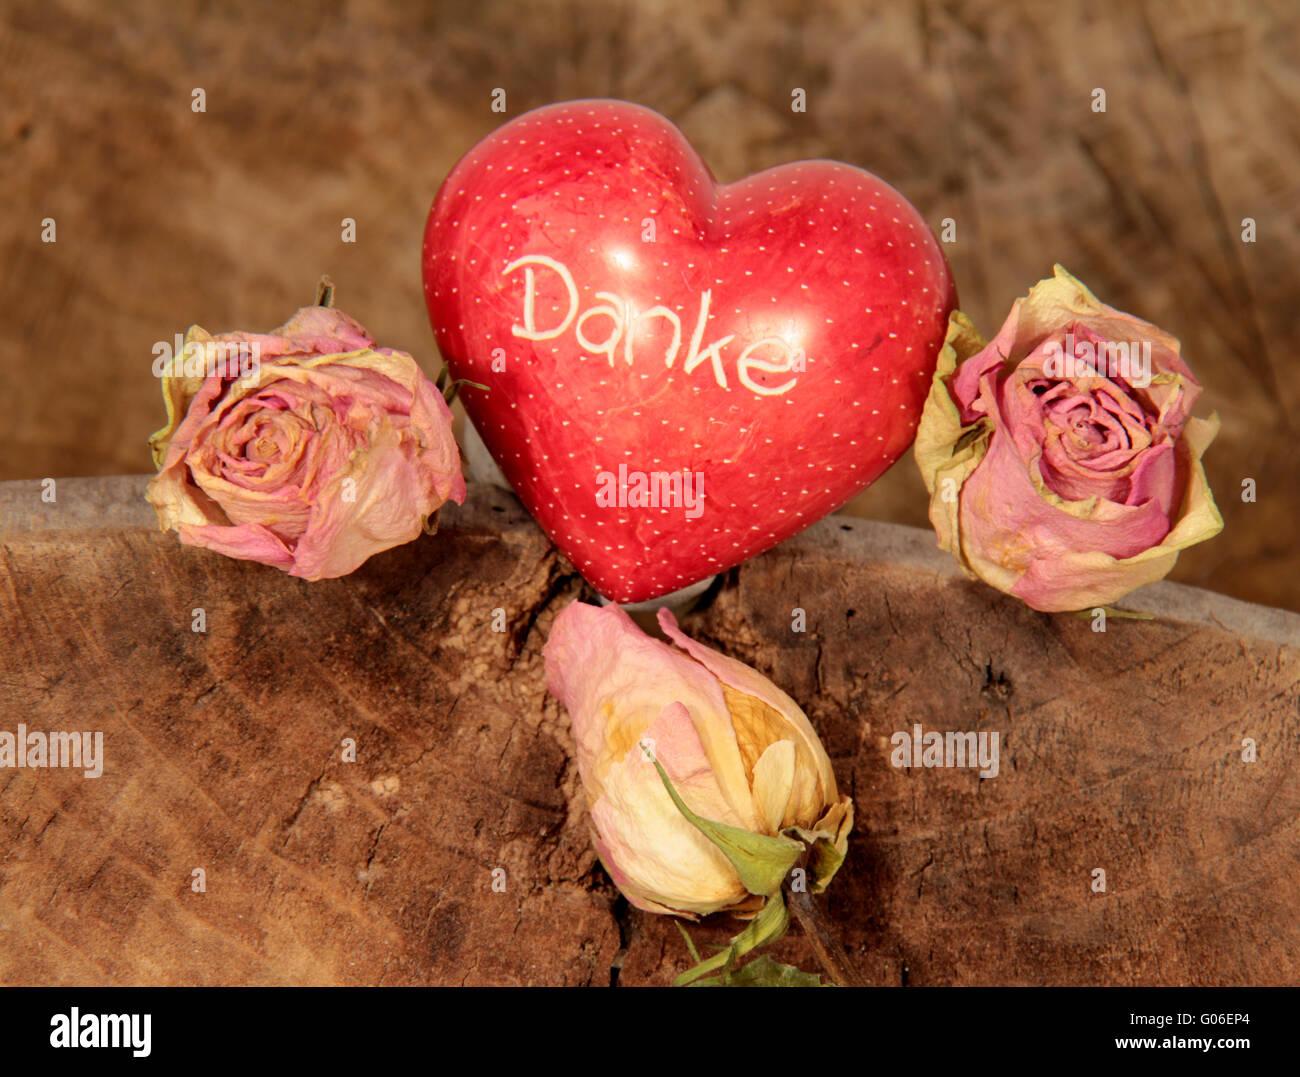 nostalgia roses still-life - Stock Image